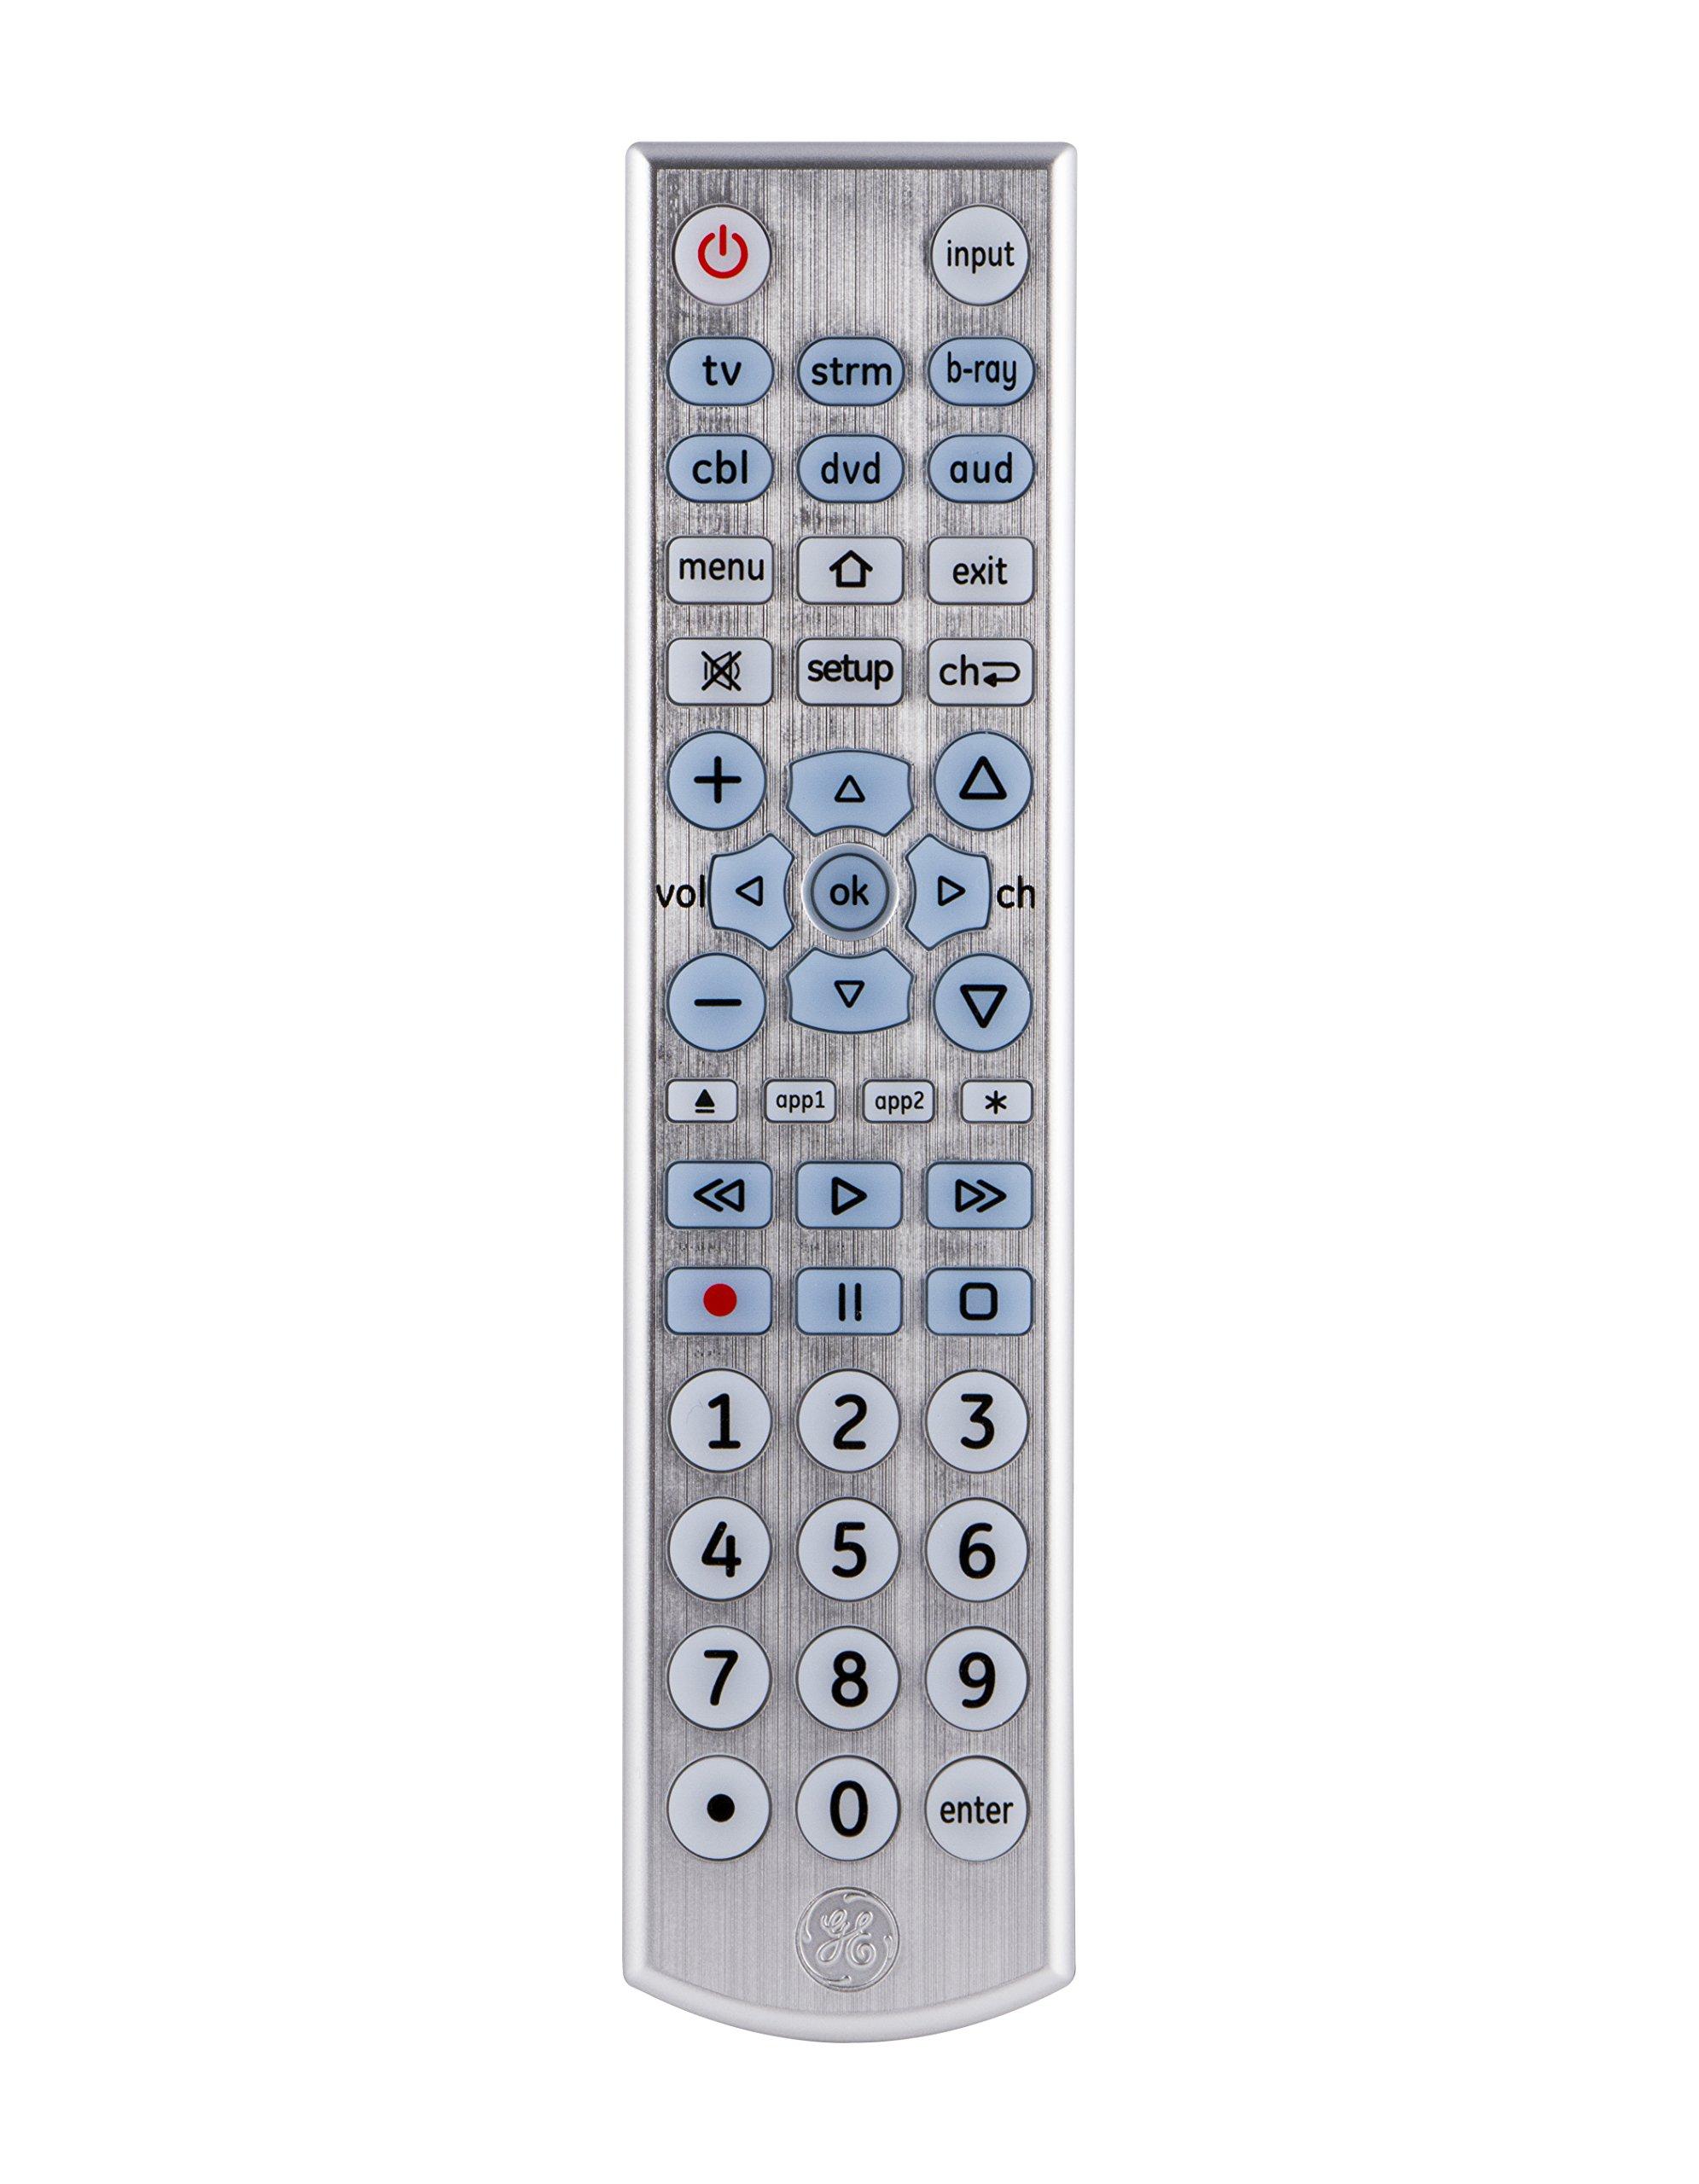 GE 33712 6-Device Big Button Universal Remote Control, Soft-Blue LED Fully Backlit, Designer Series by GE